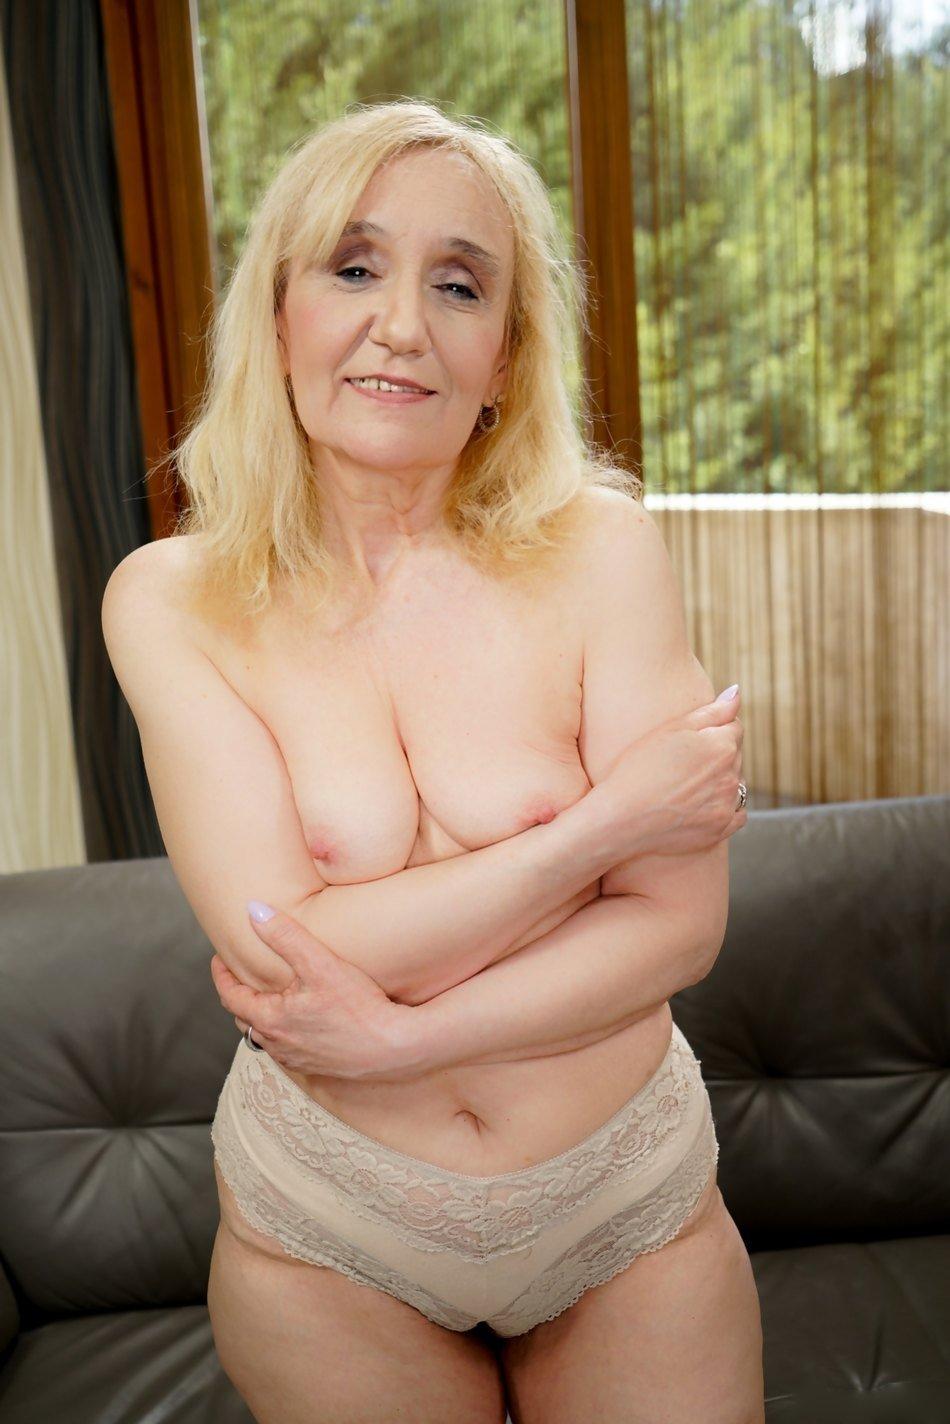 LadyAlayna from Belfast City,United Kingdom